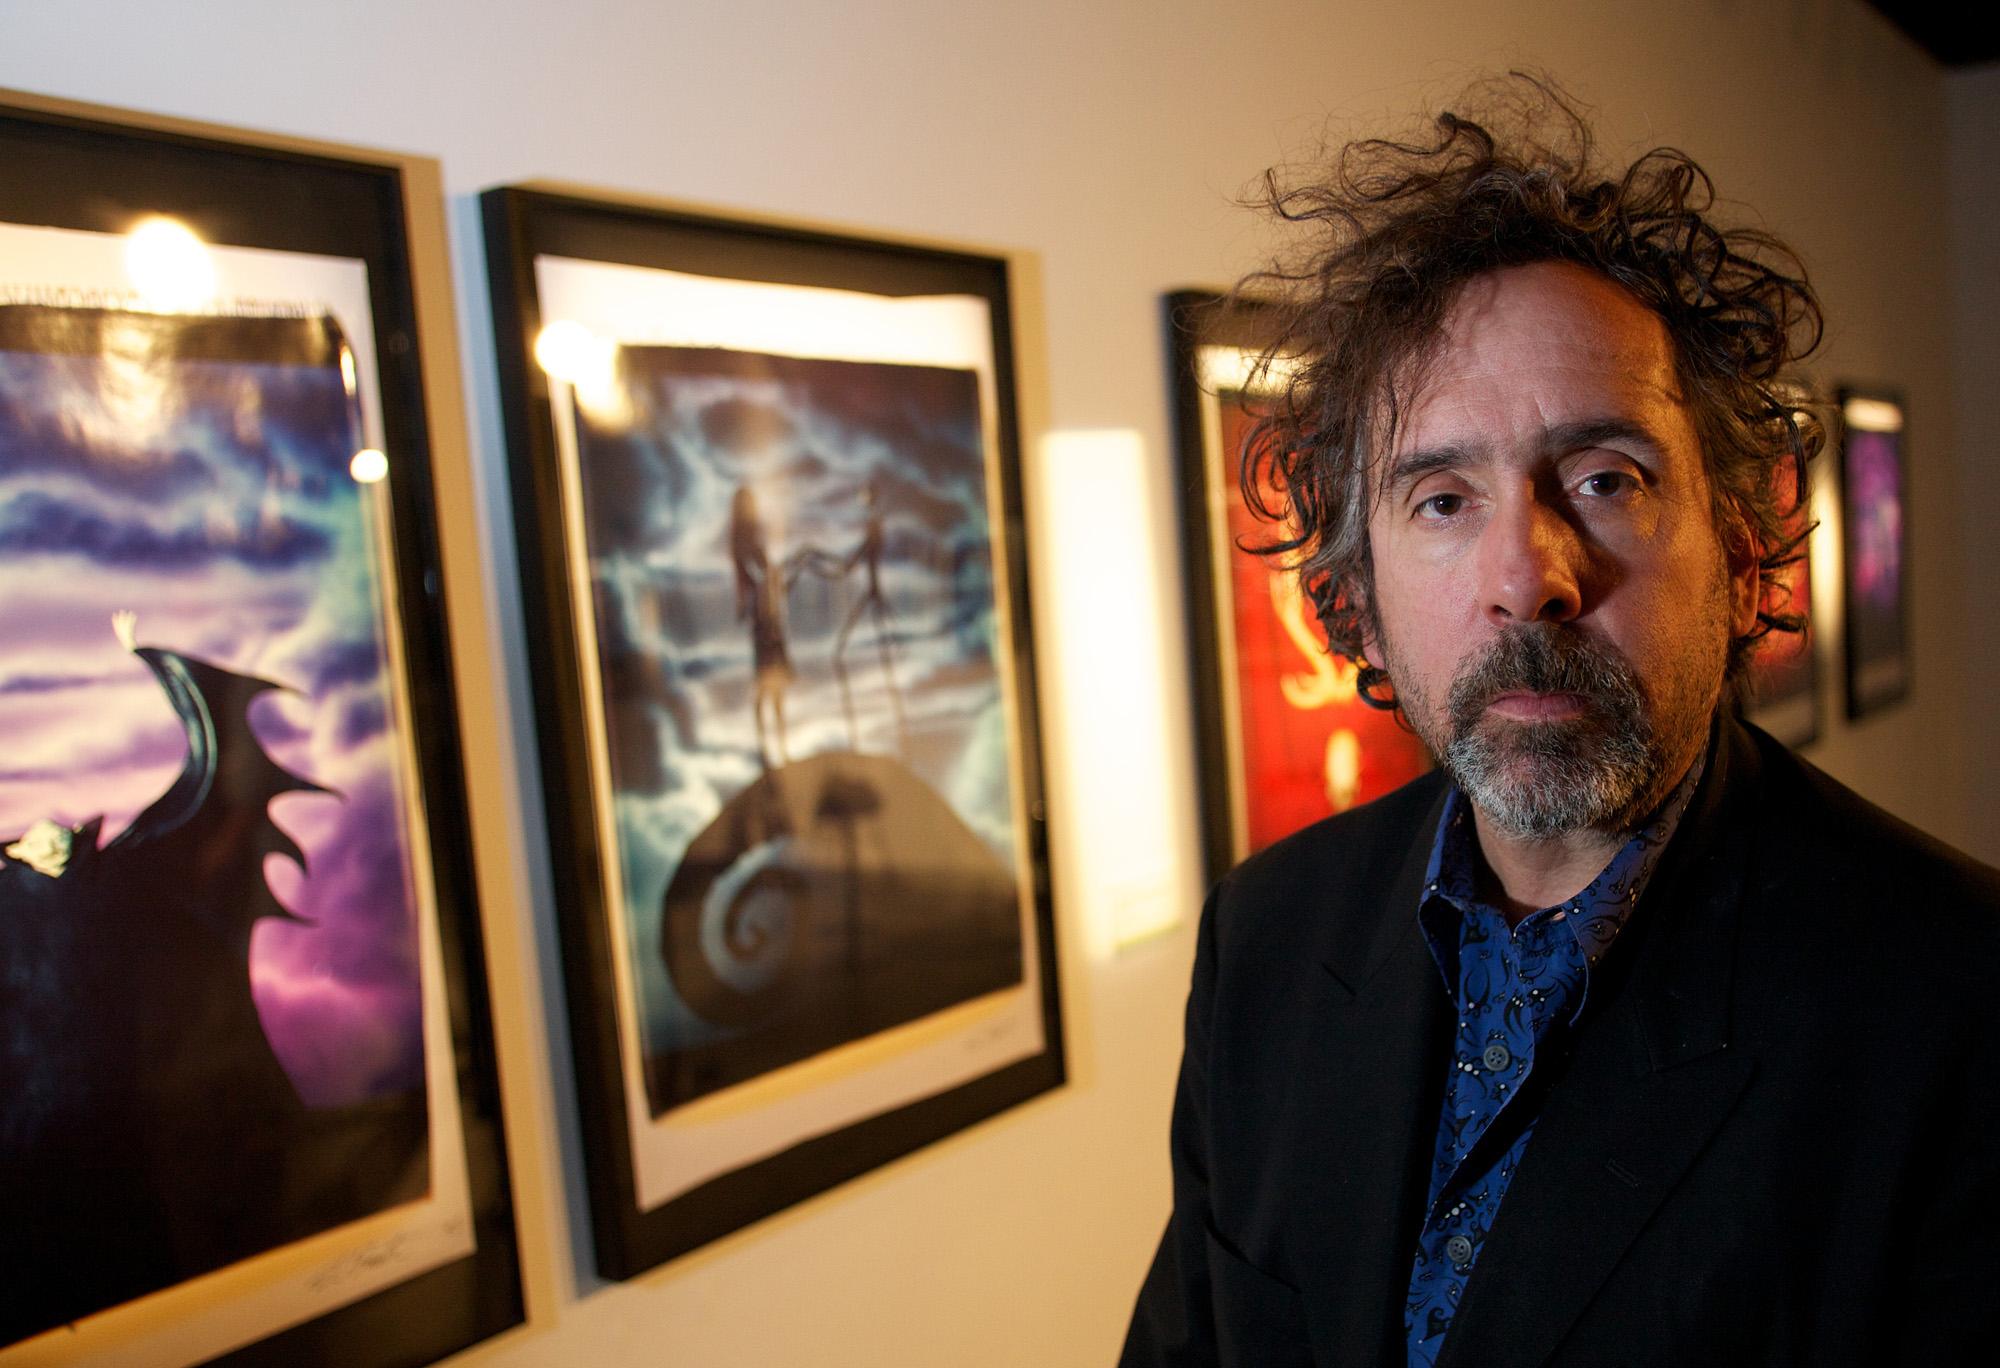 Tim-Burton-and-artworks